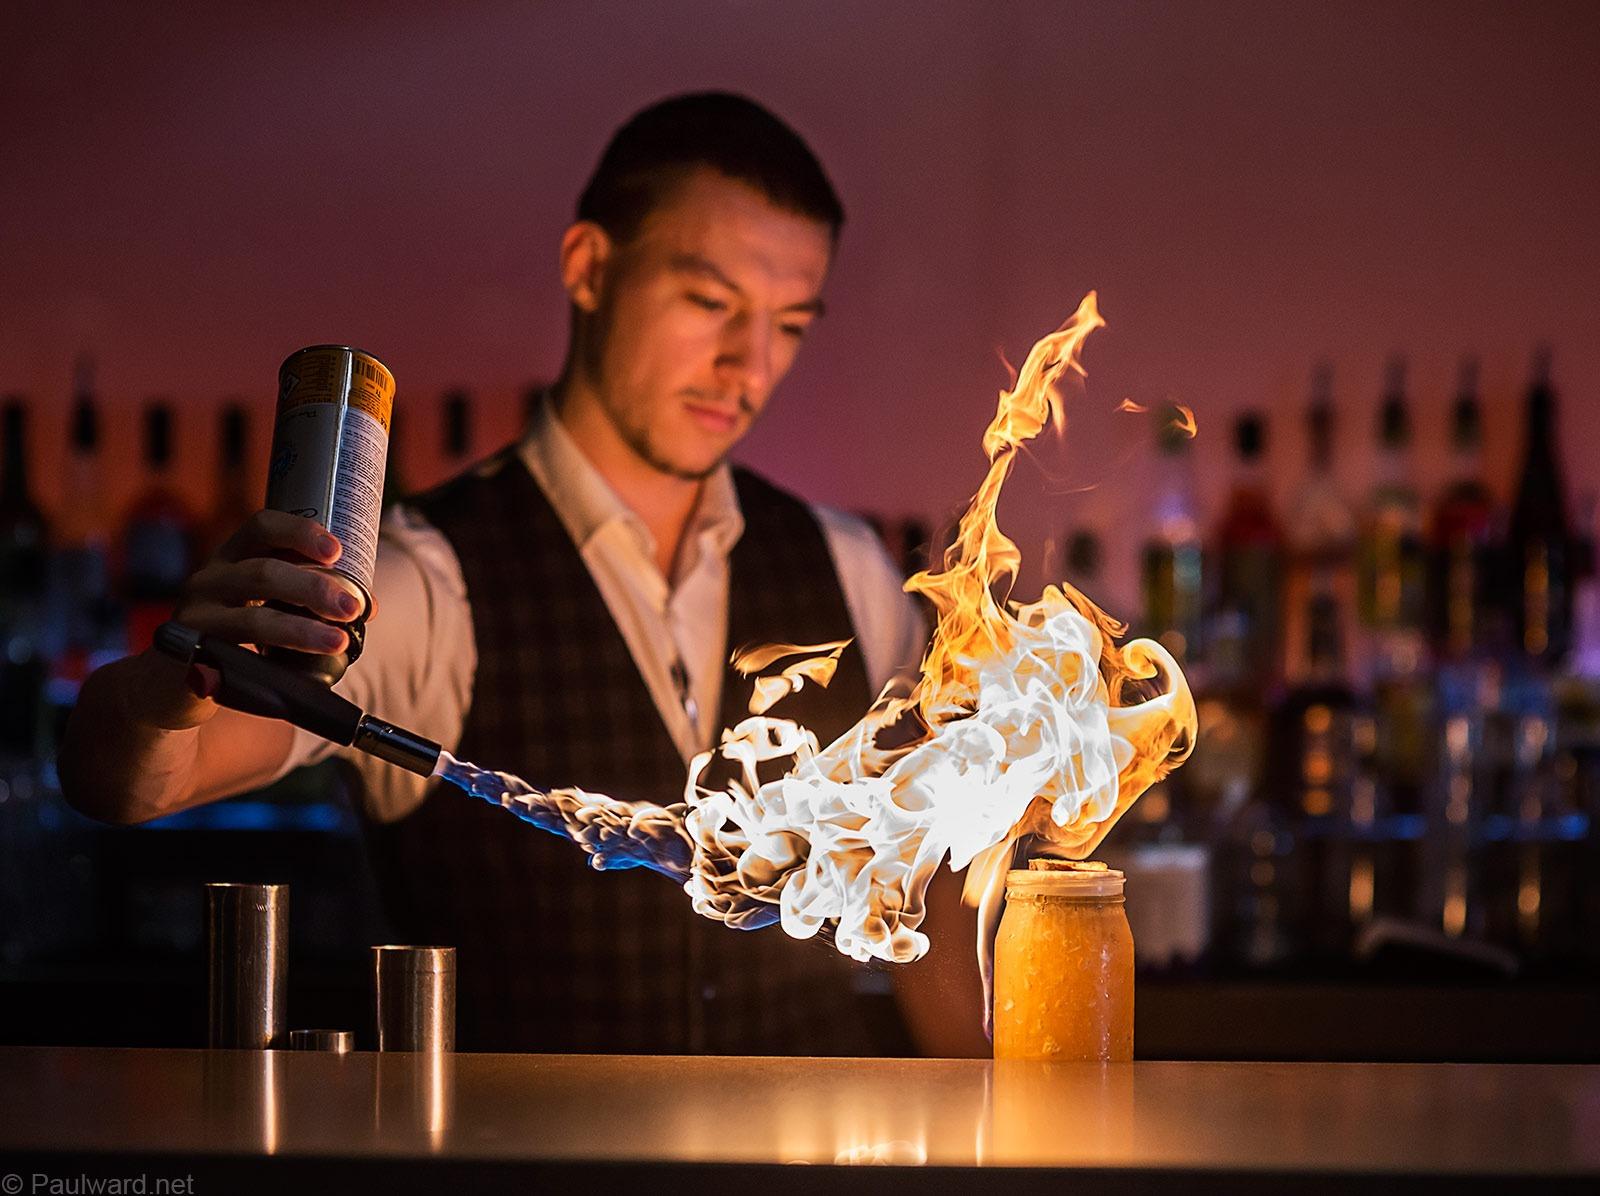 Barman, Portrait photographer Birmingham, award winning photography by Paul Ward